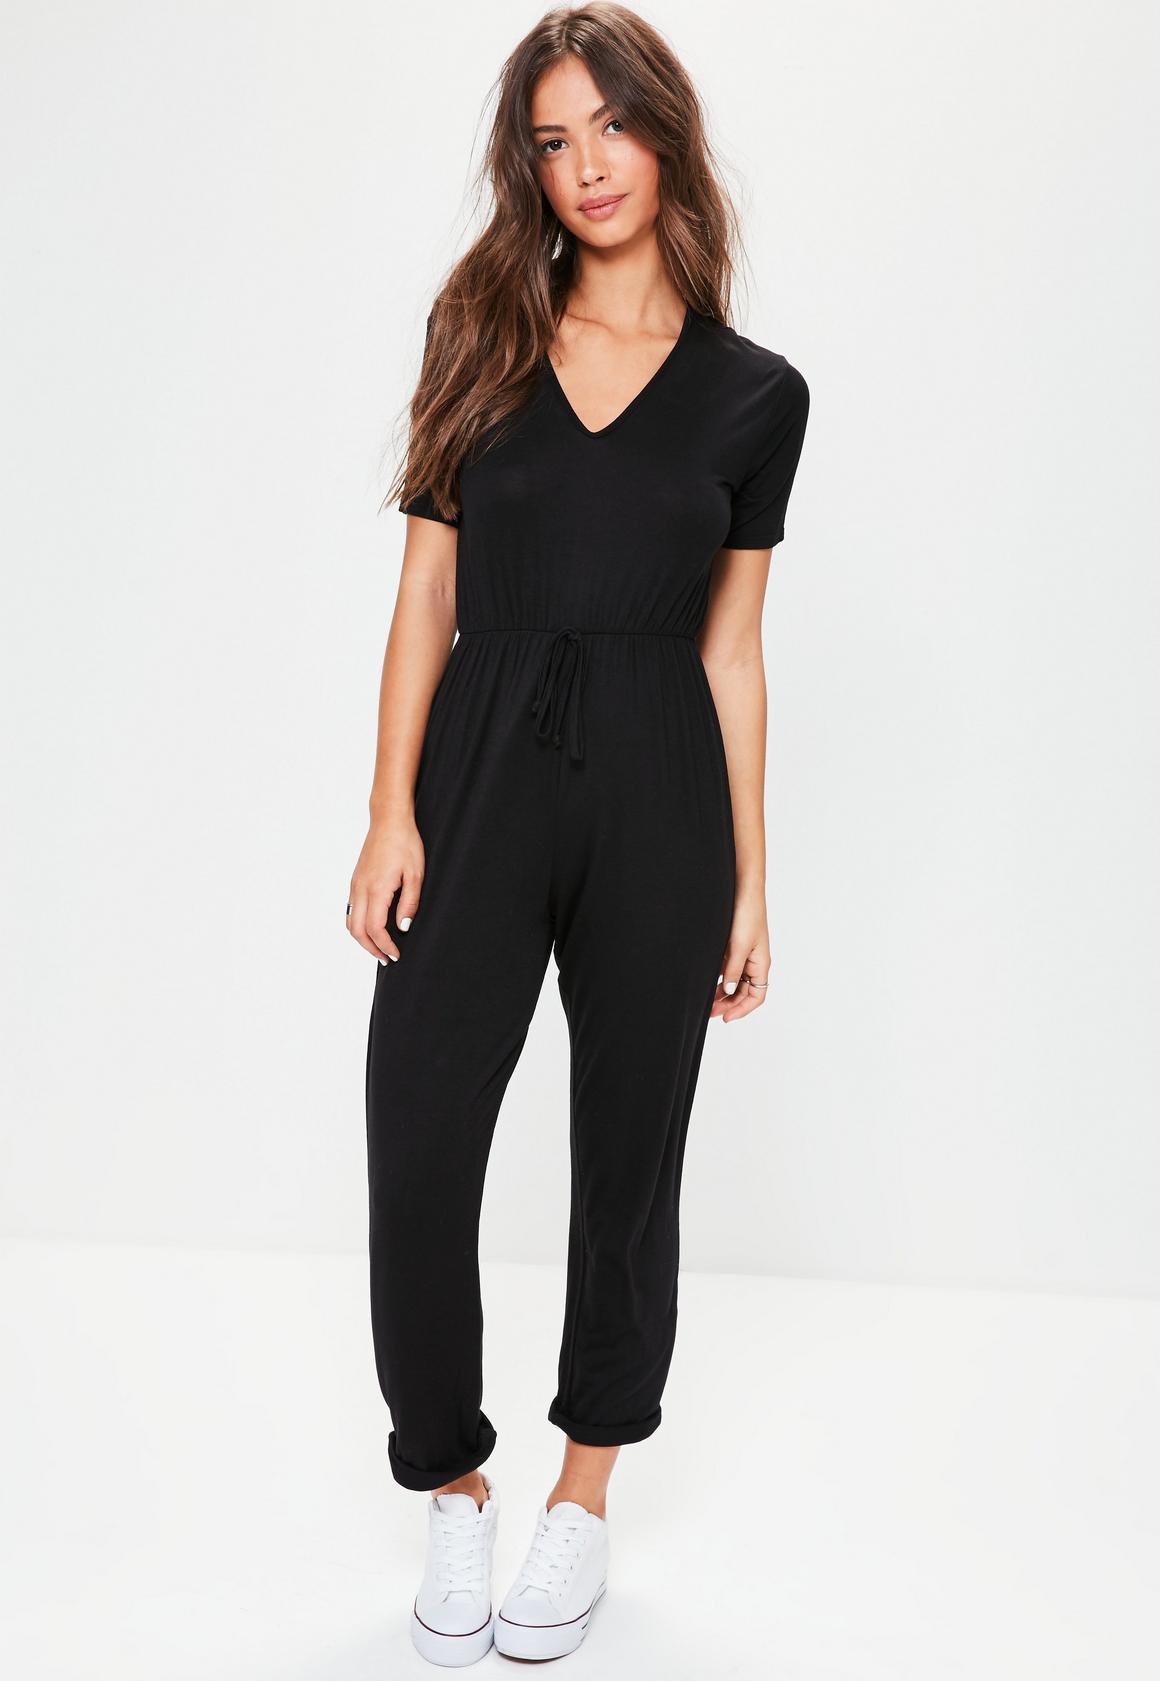 Black Jersey Short Sleeve Jumpsuit - Missguided